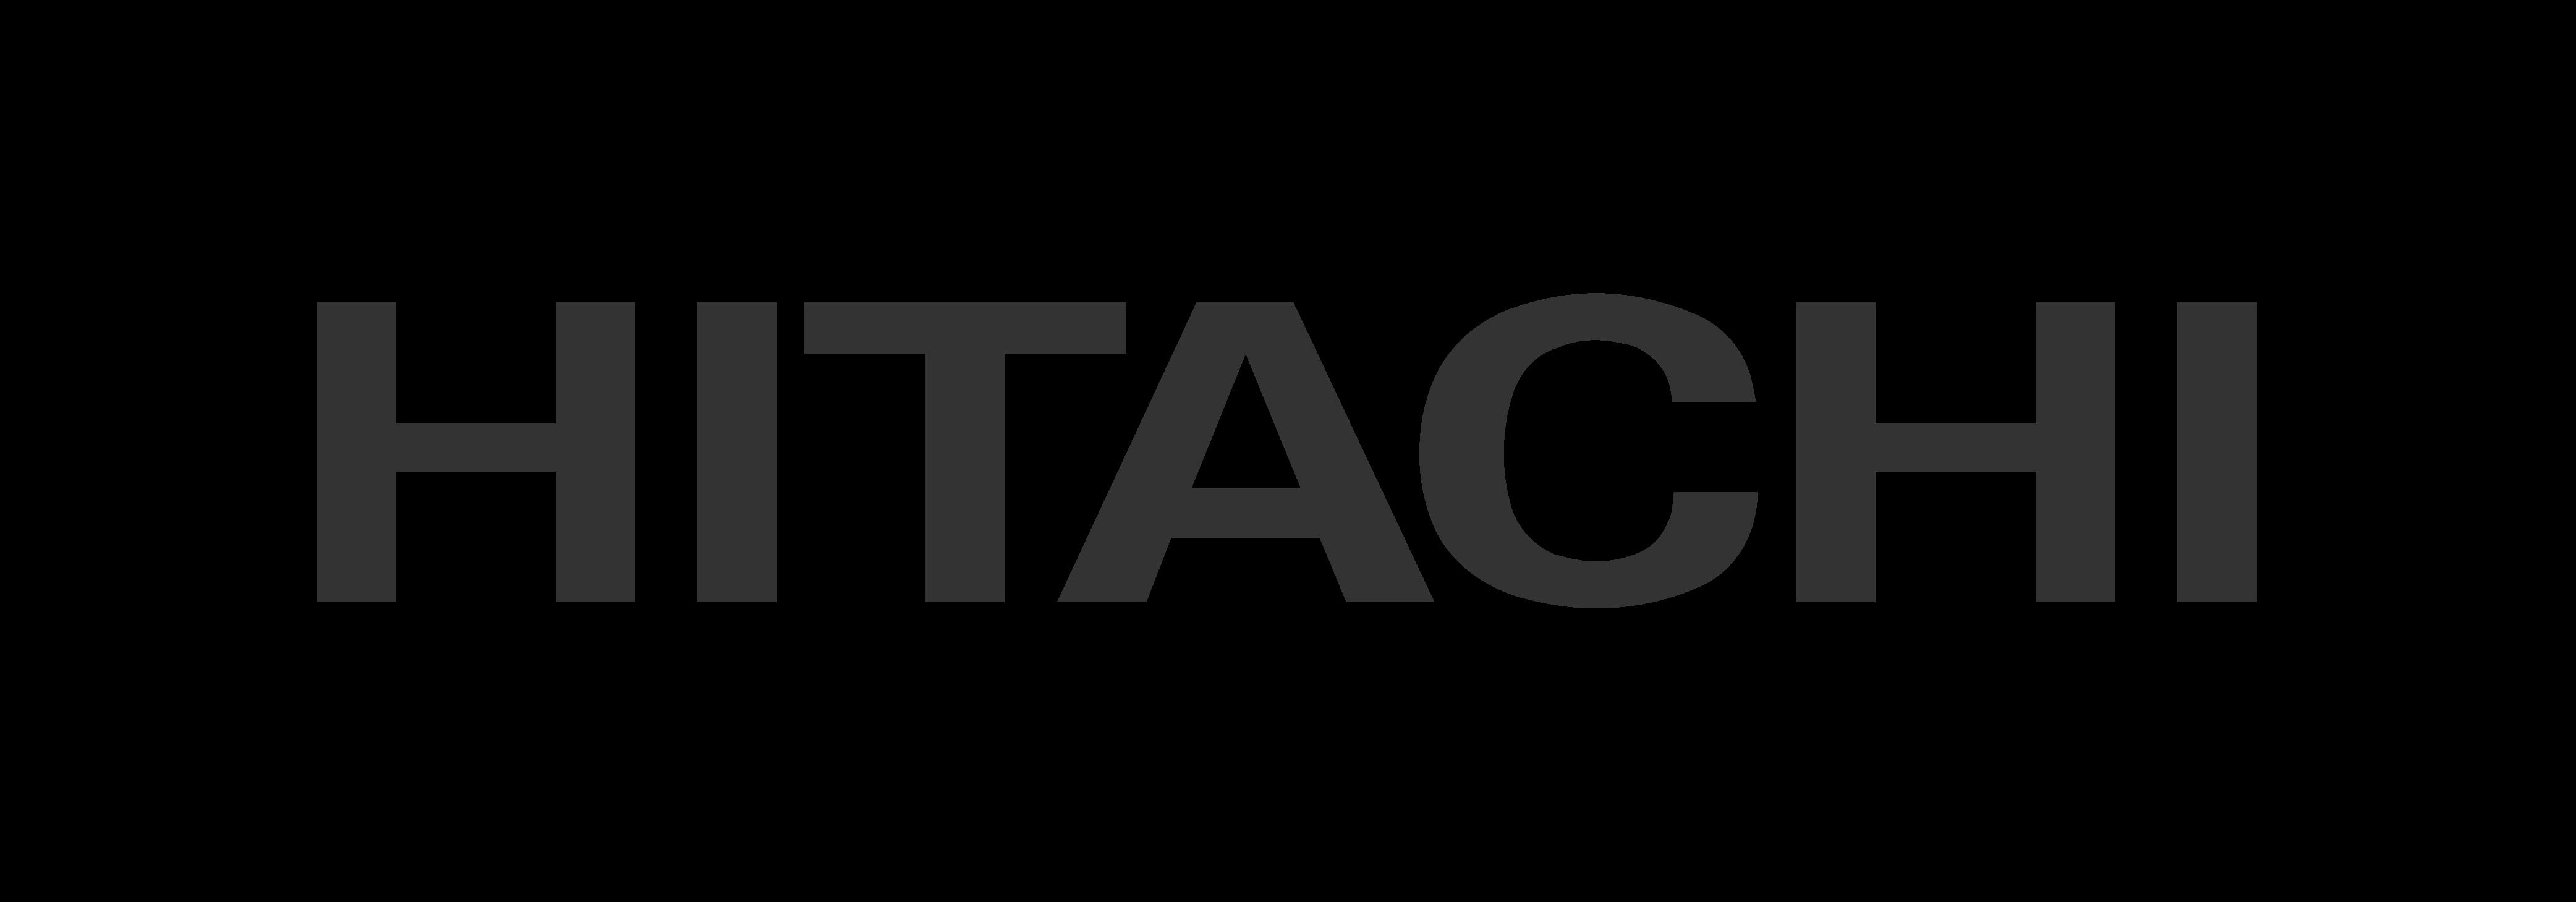 hitachi-2-logo-png-transparent